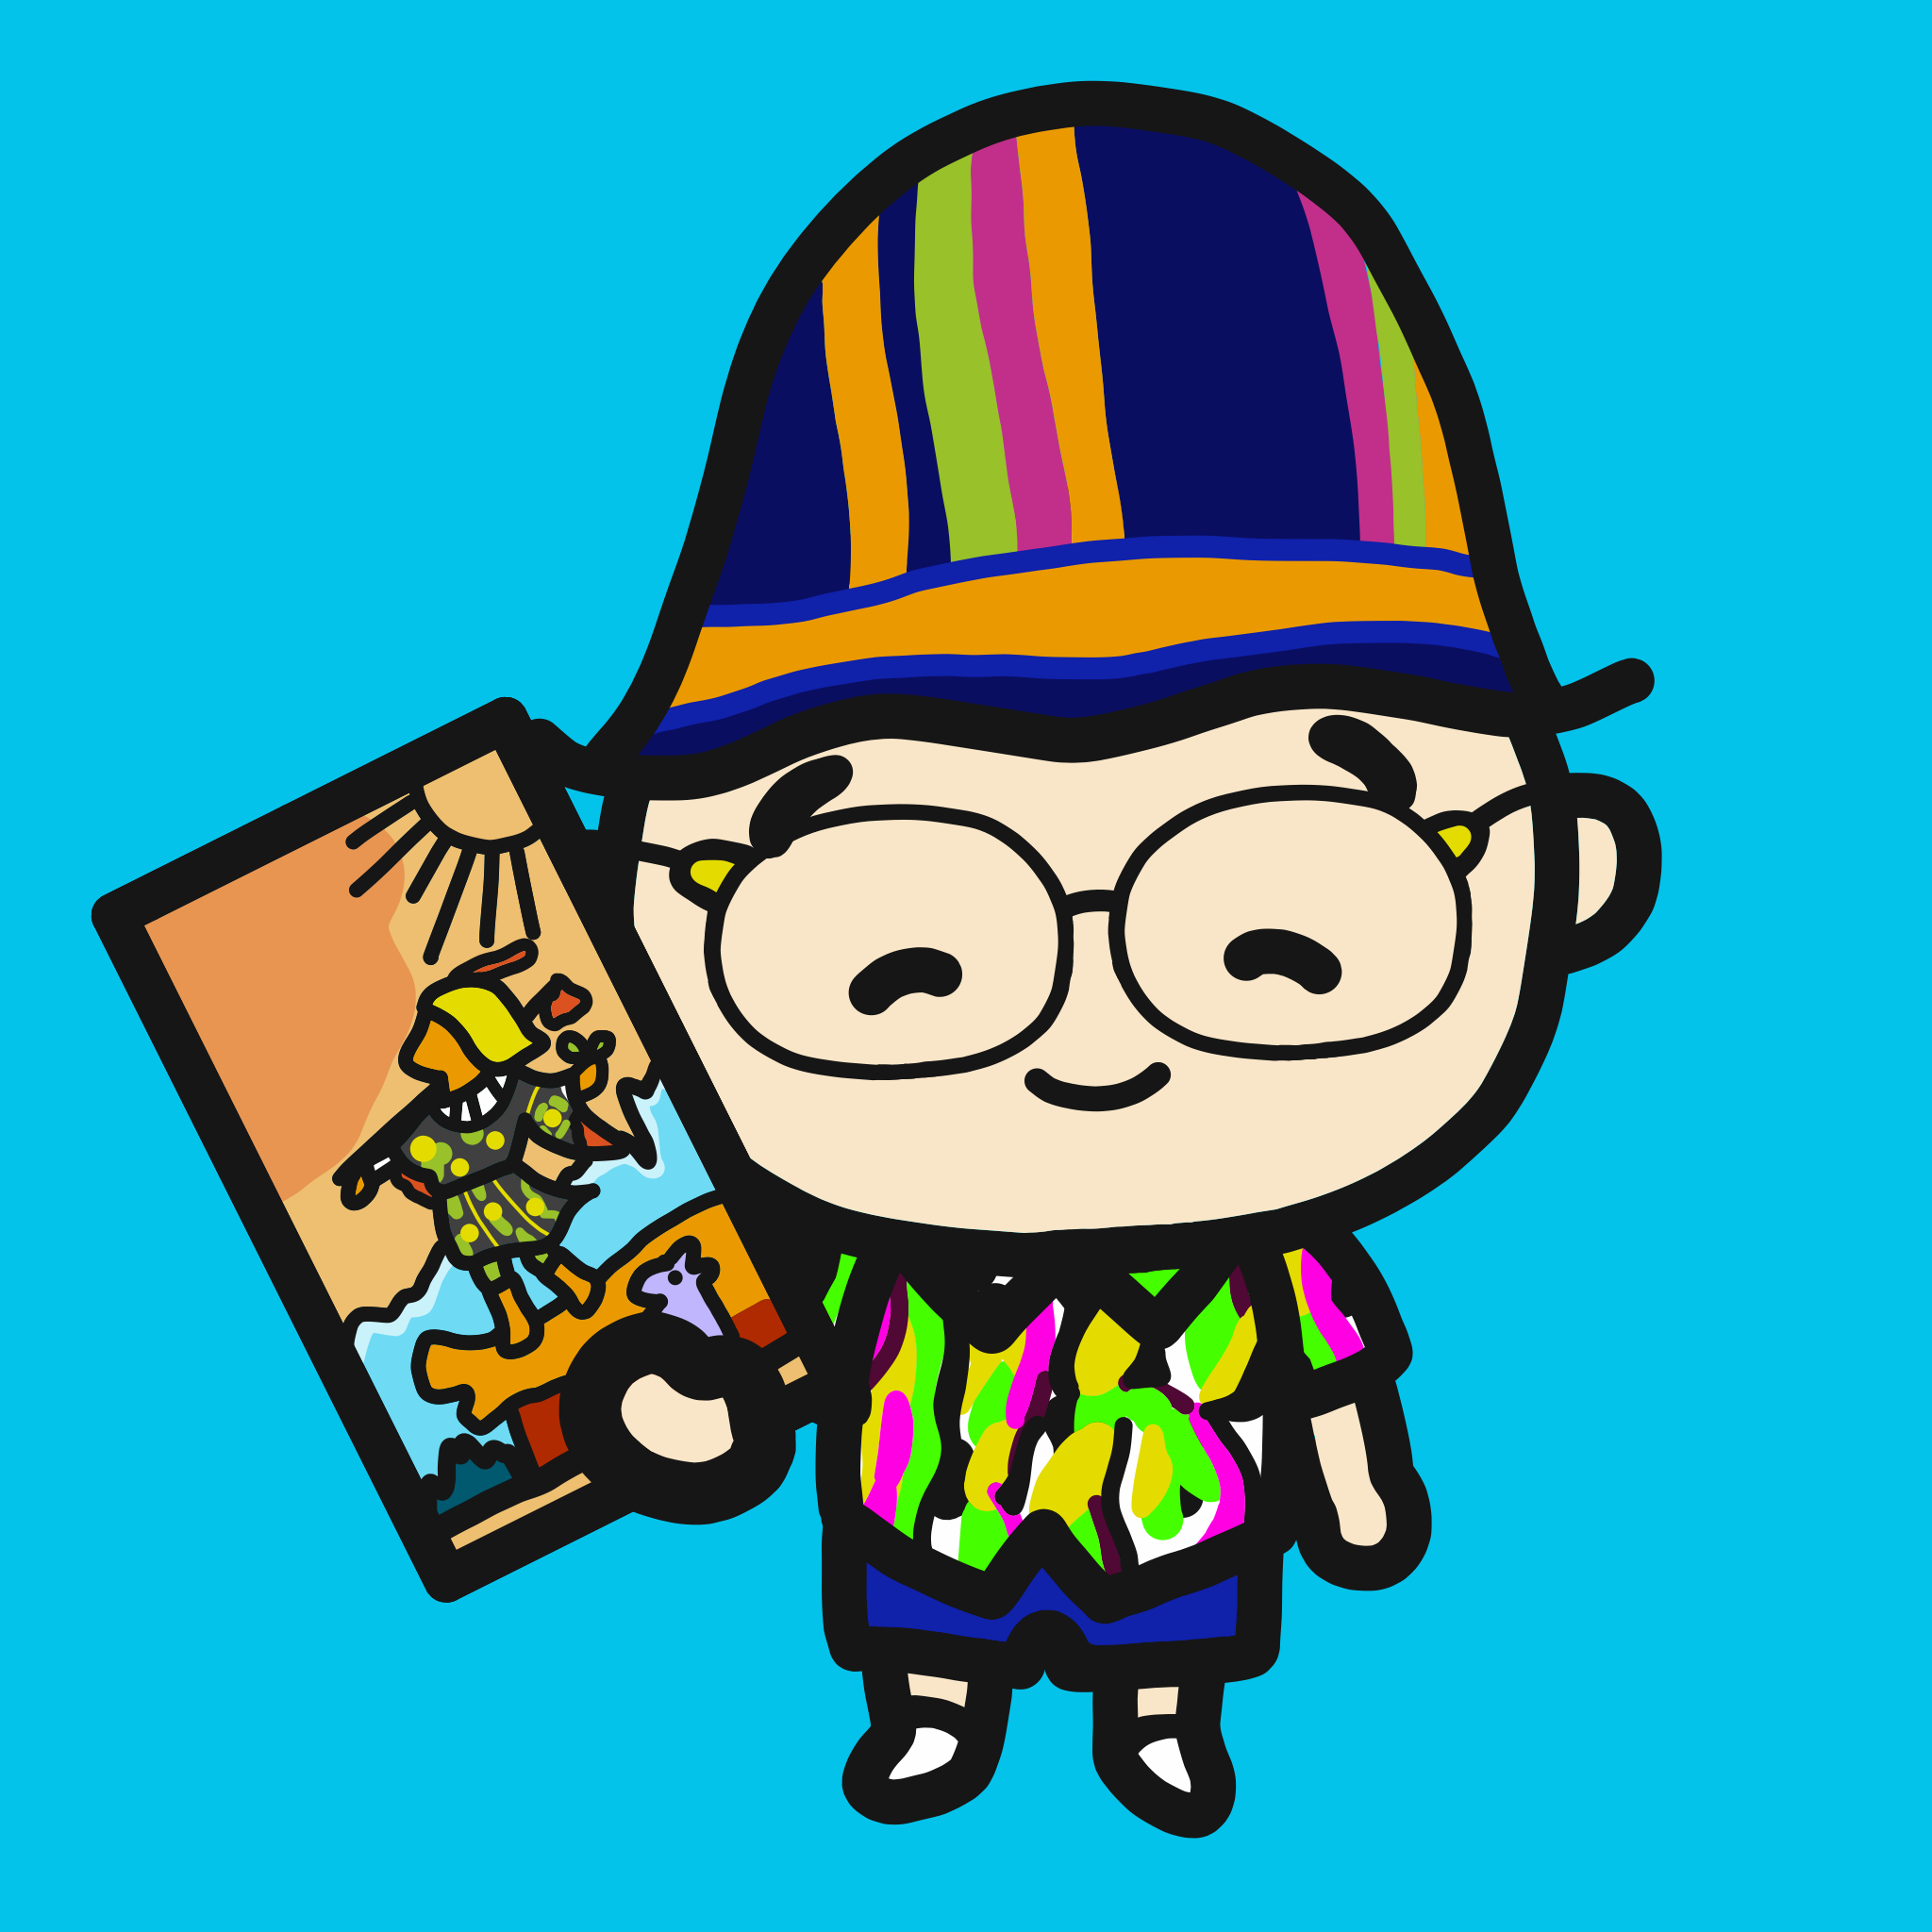 tonaminaoki